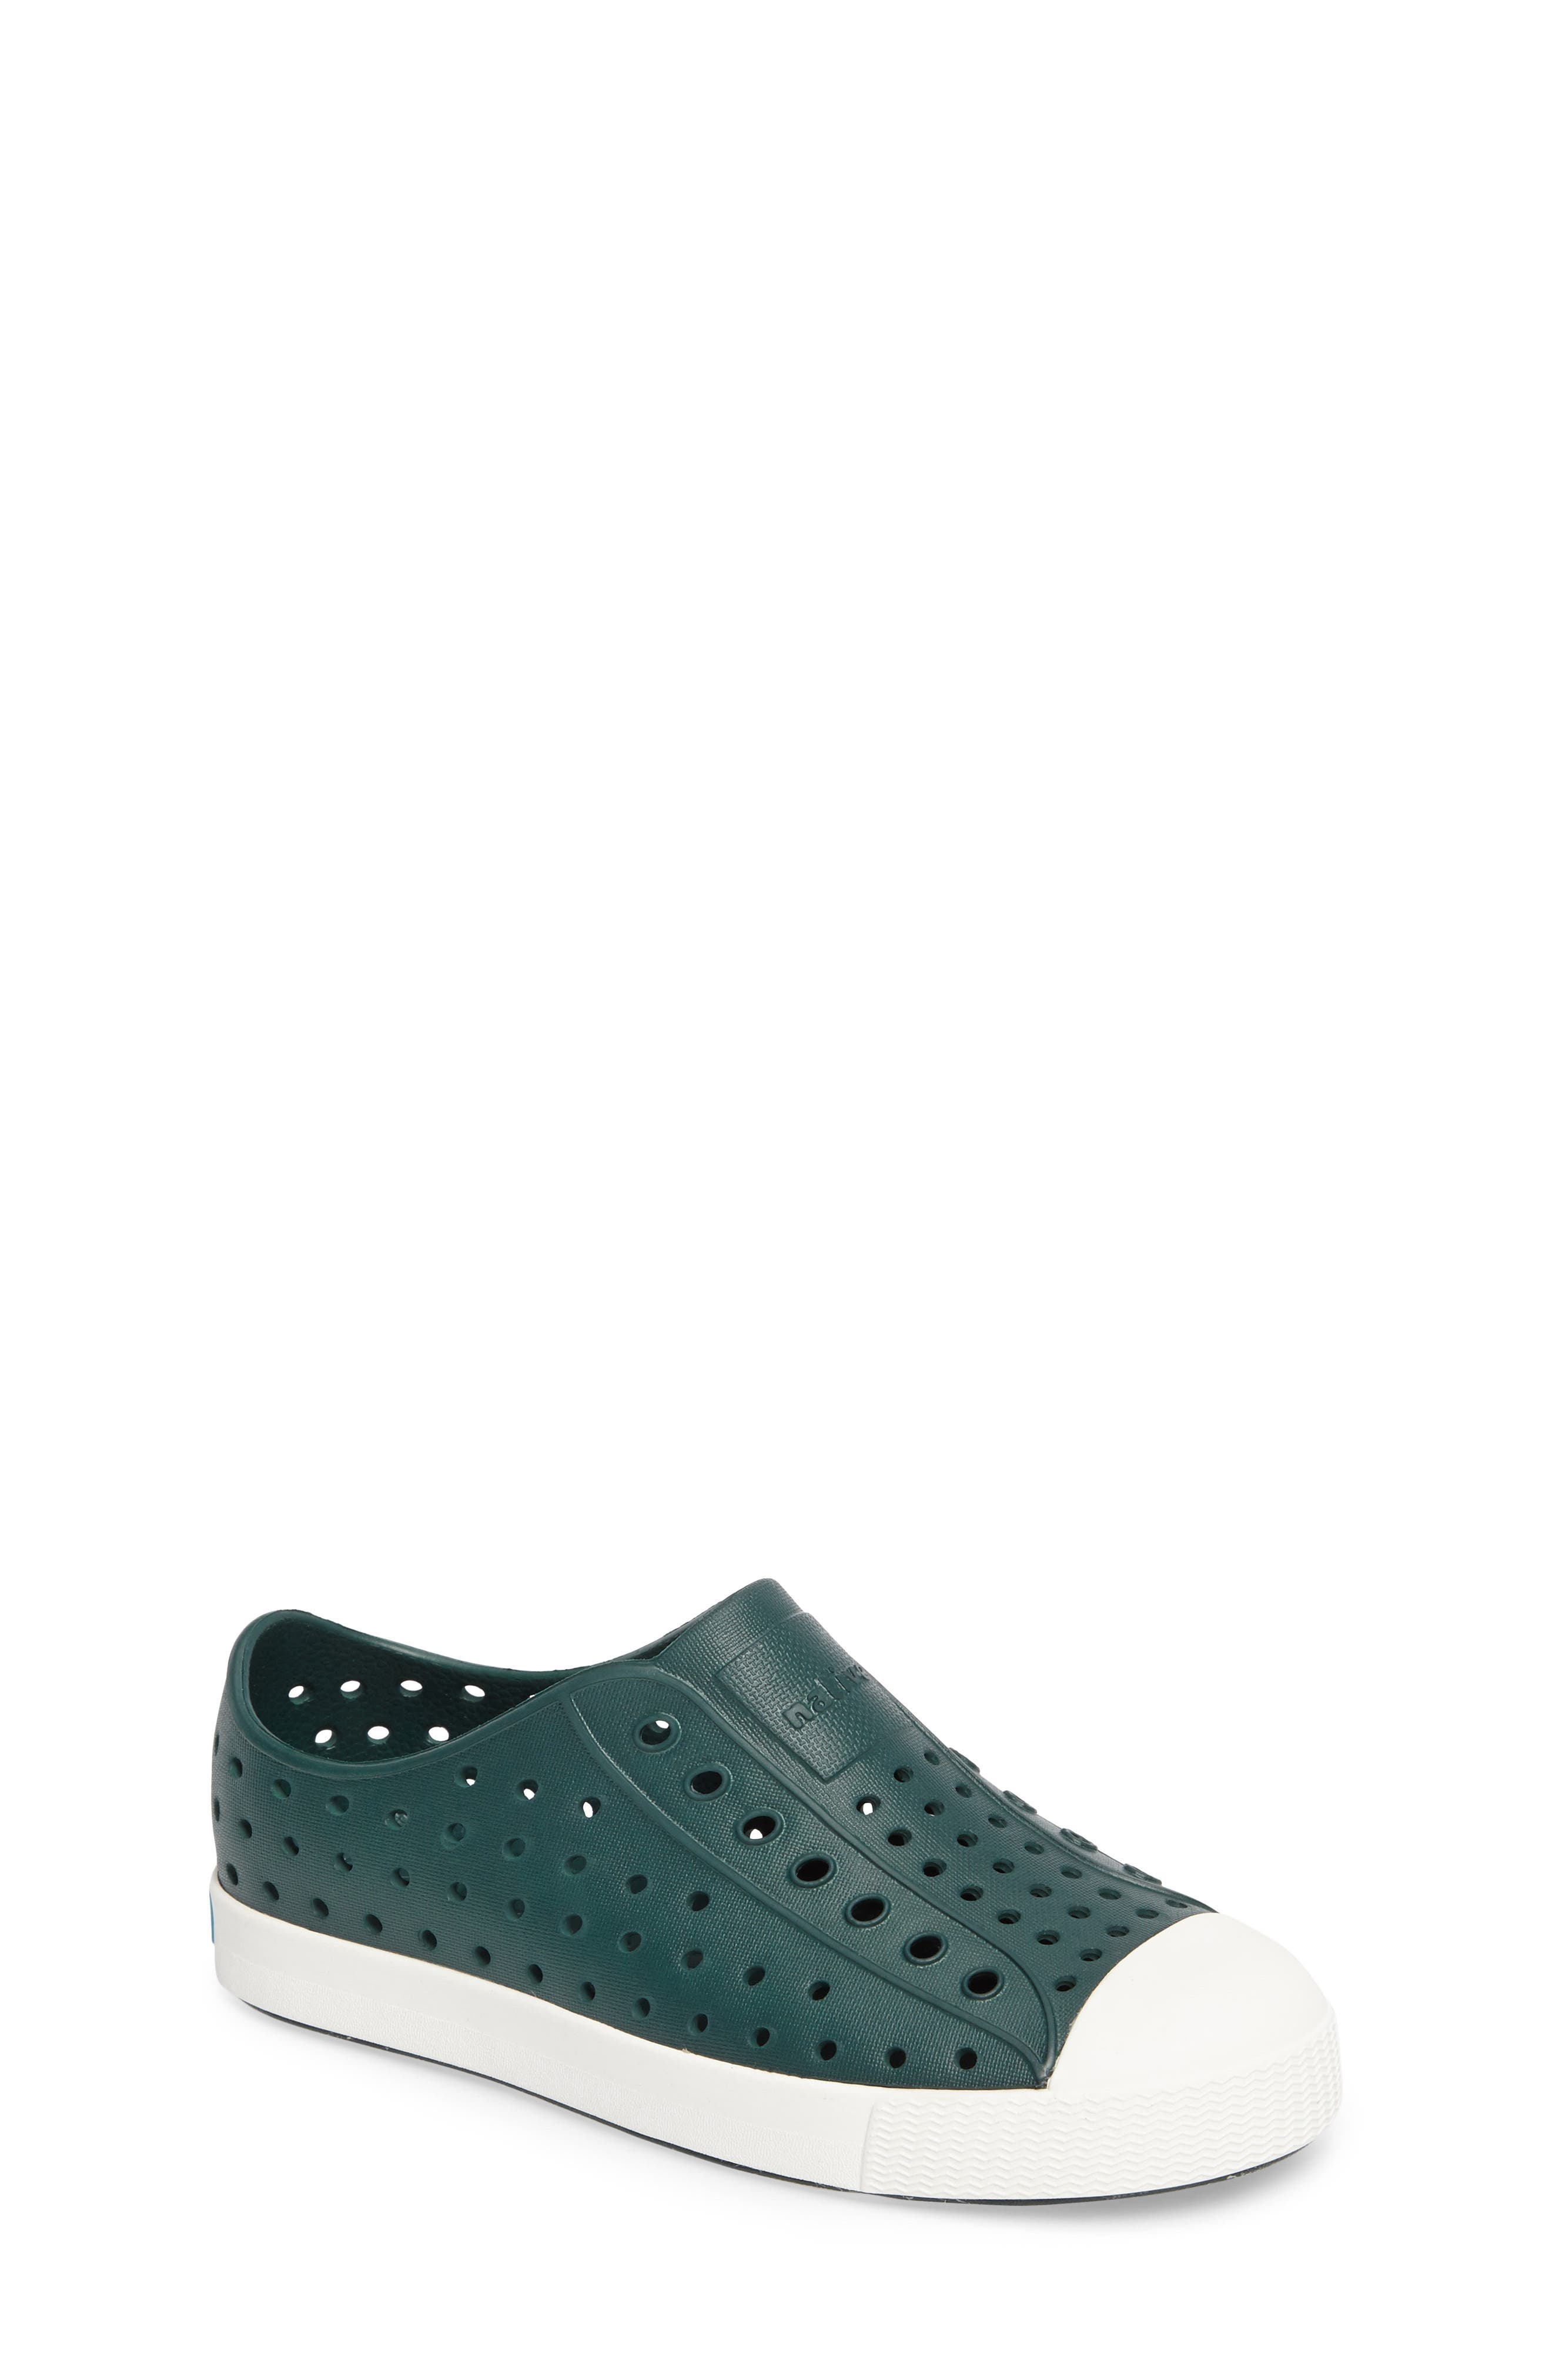 'Jefferson' Water Friendly Slip-On Sneaker,                             Main thumbnail 33, color,